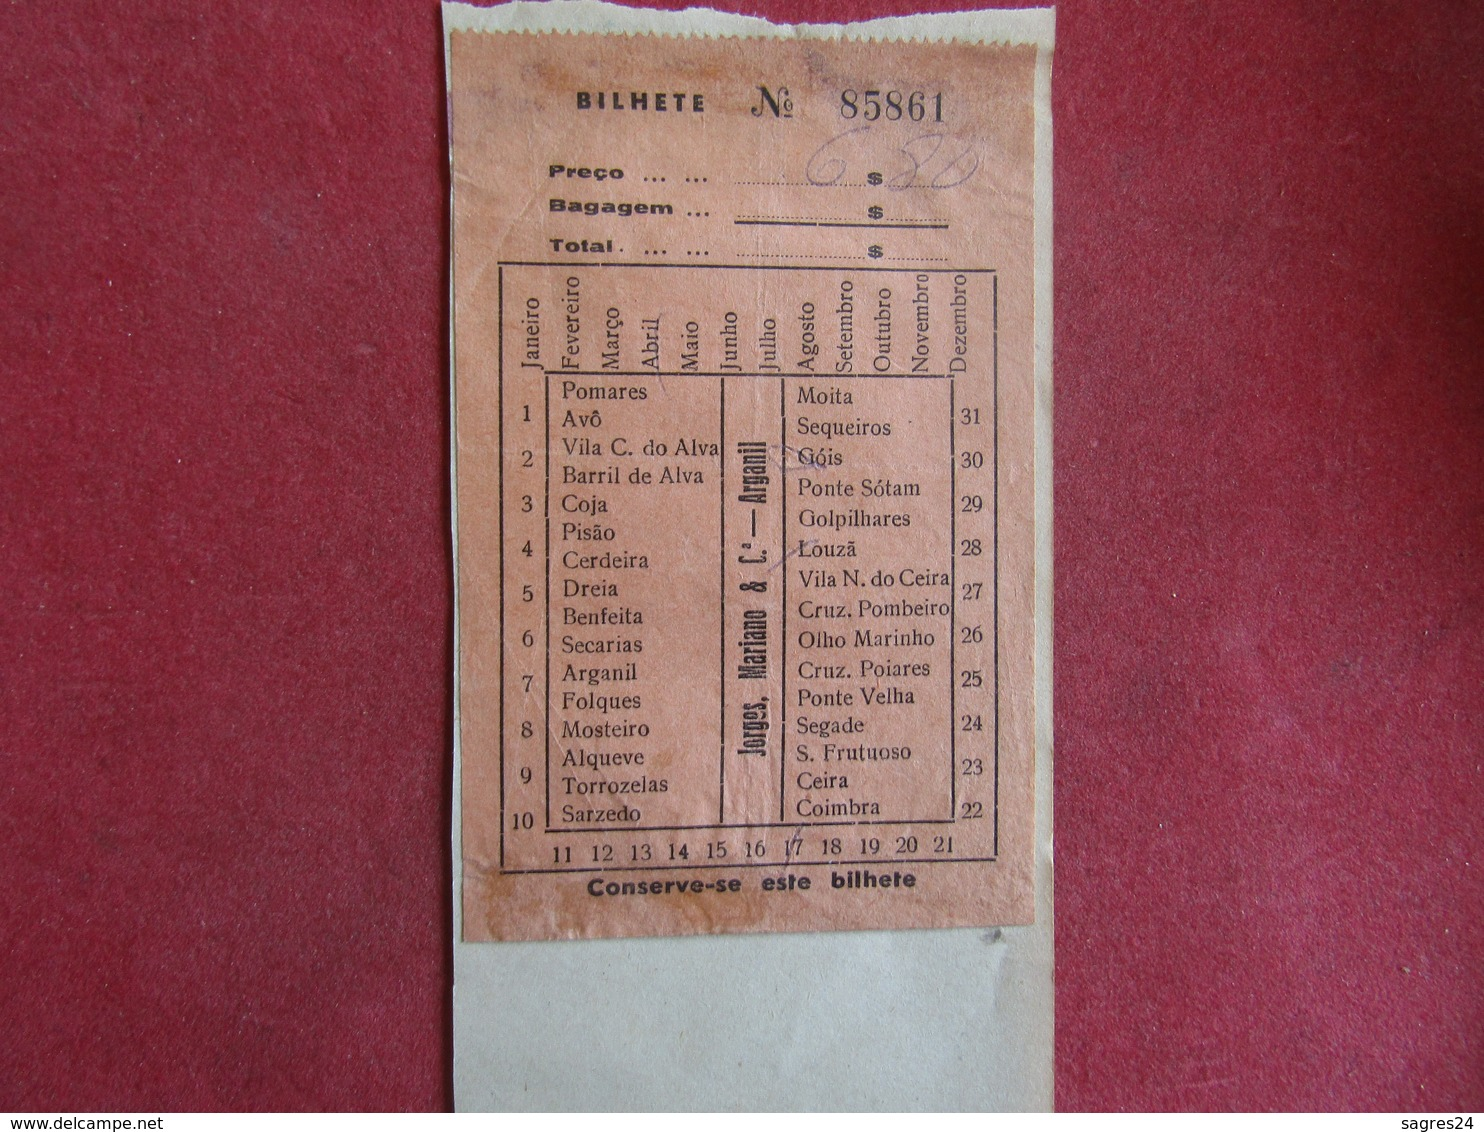 Ticket De Transporte De Jorges,Mariano & Cª - Arganil - Bilhete De Transporte - Bus